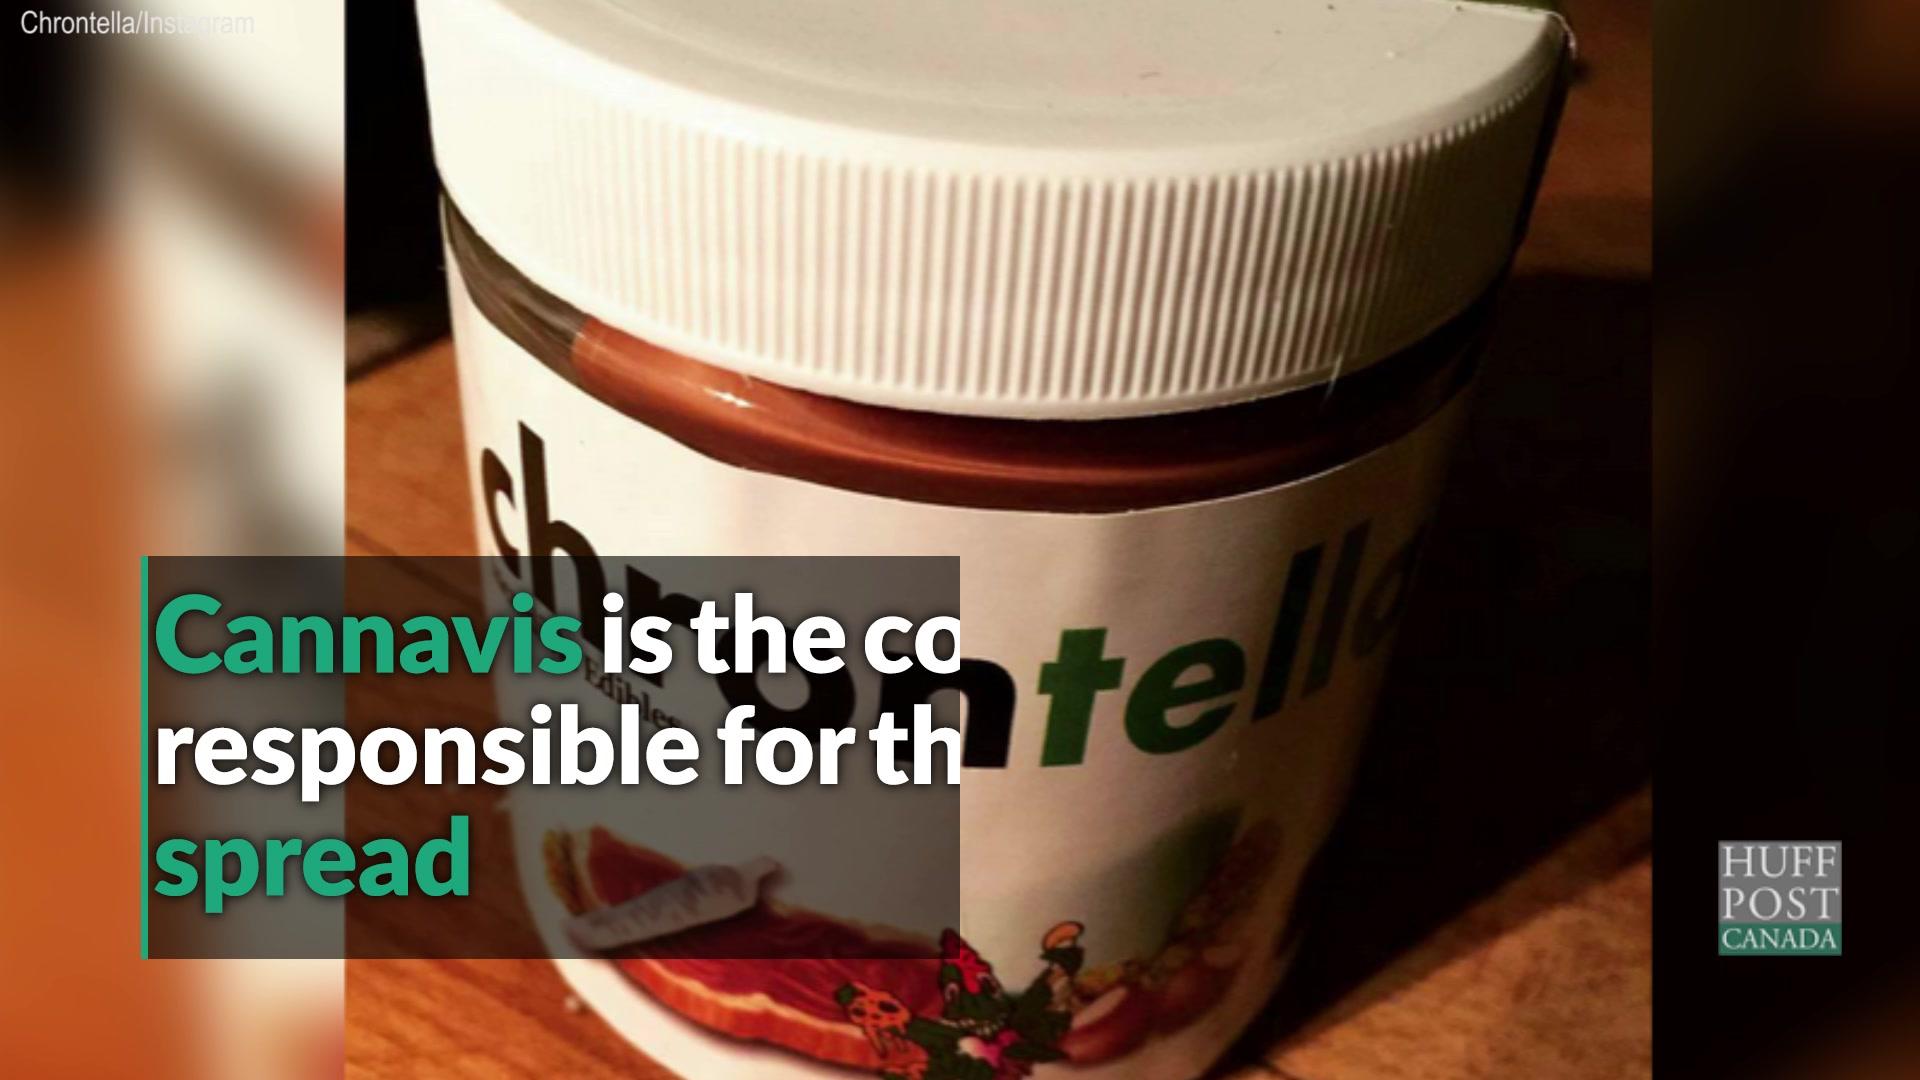 Chrontella: Like Nutella, But For Stoners